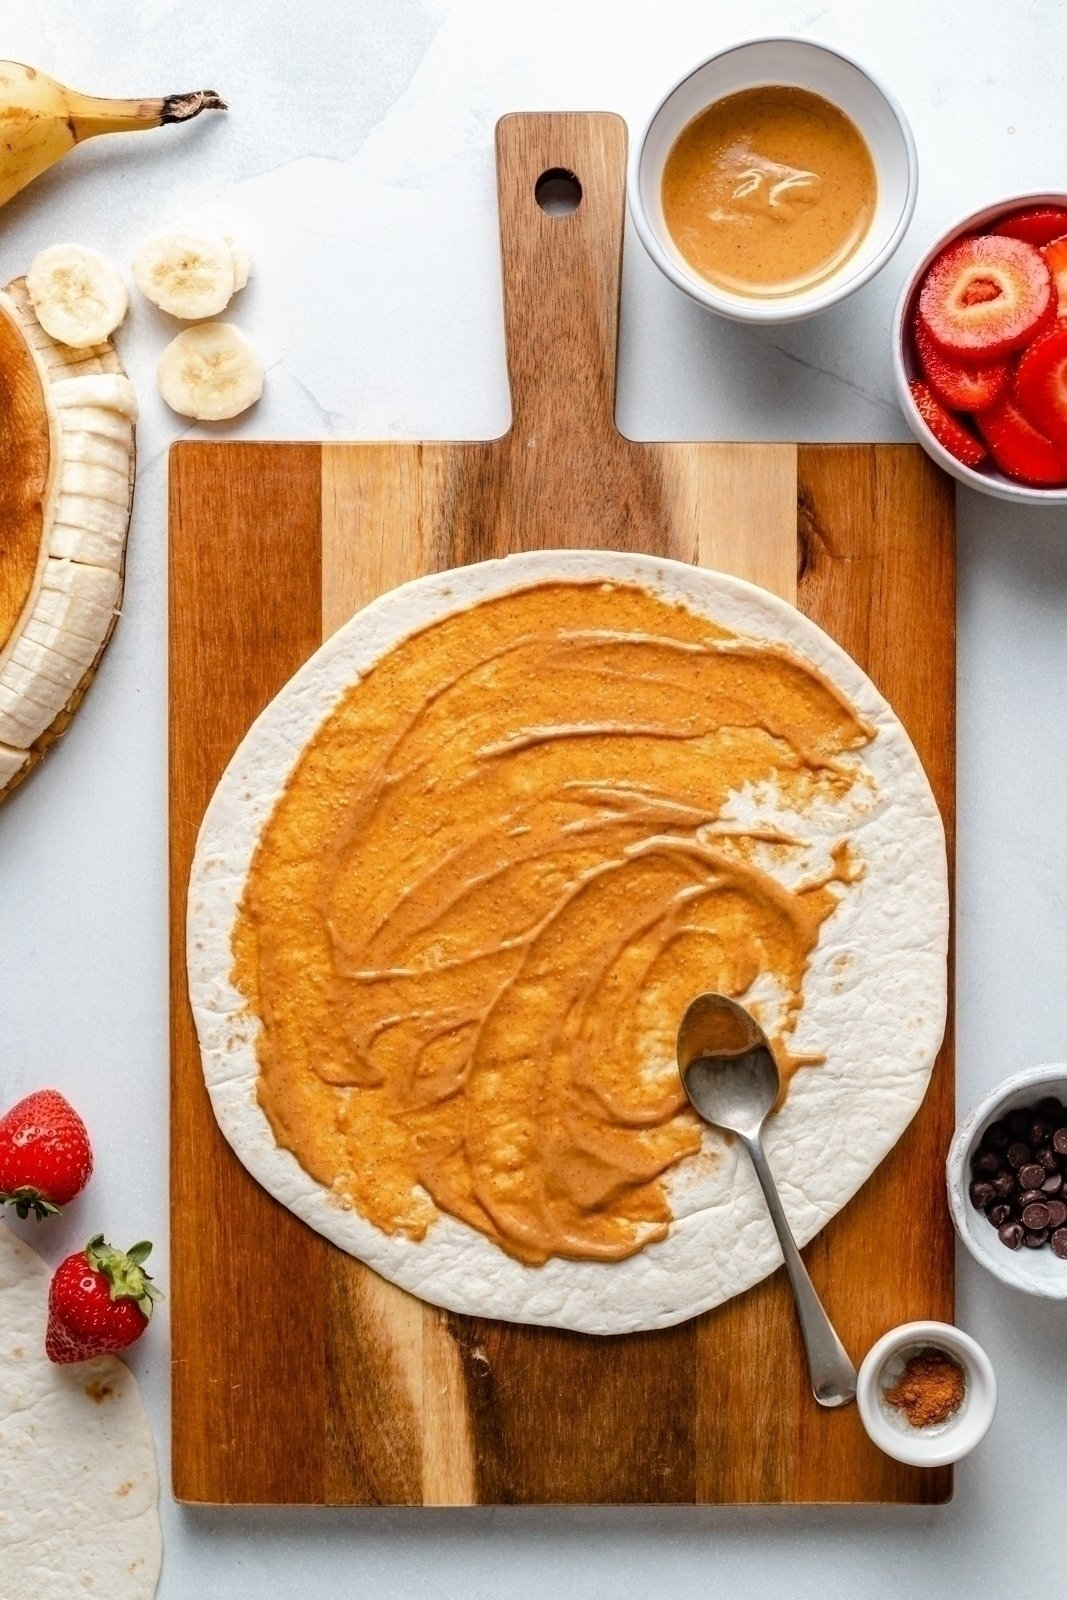 spreading peanut butter on a tortilla to make a strawberry banana quesadilla